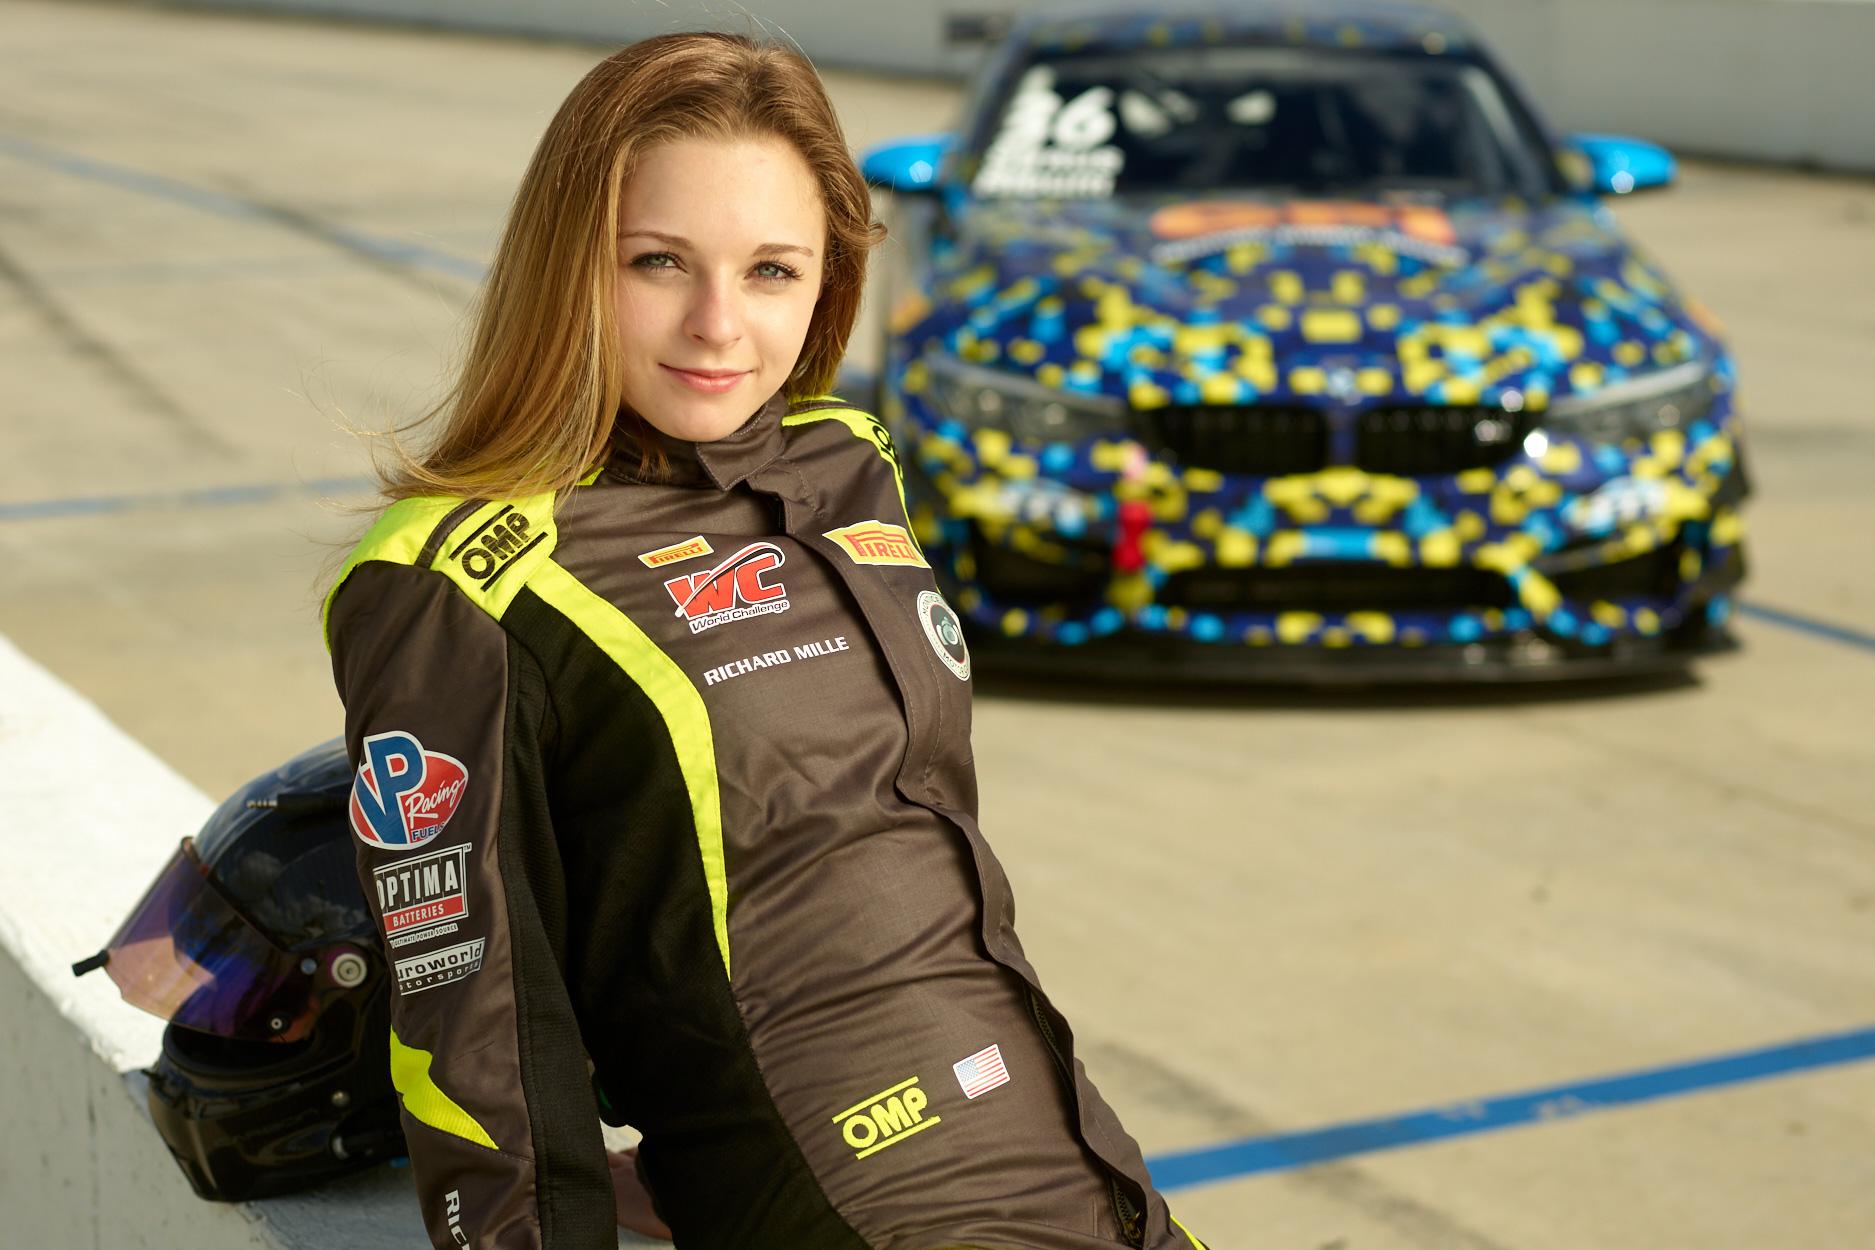 10 Most Appealing Female Race Car Drivers   Female race